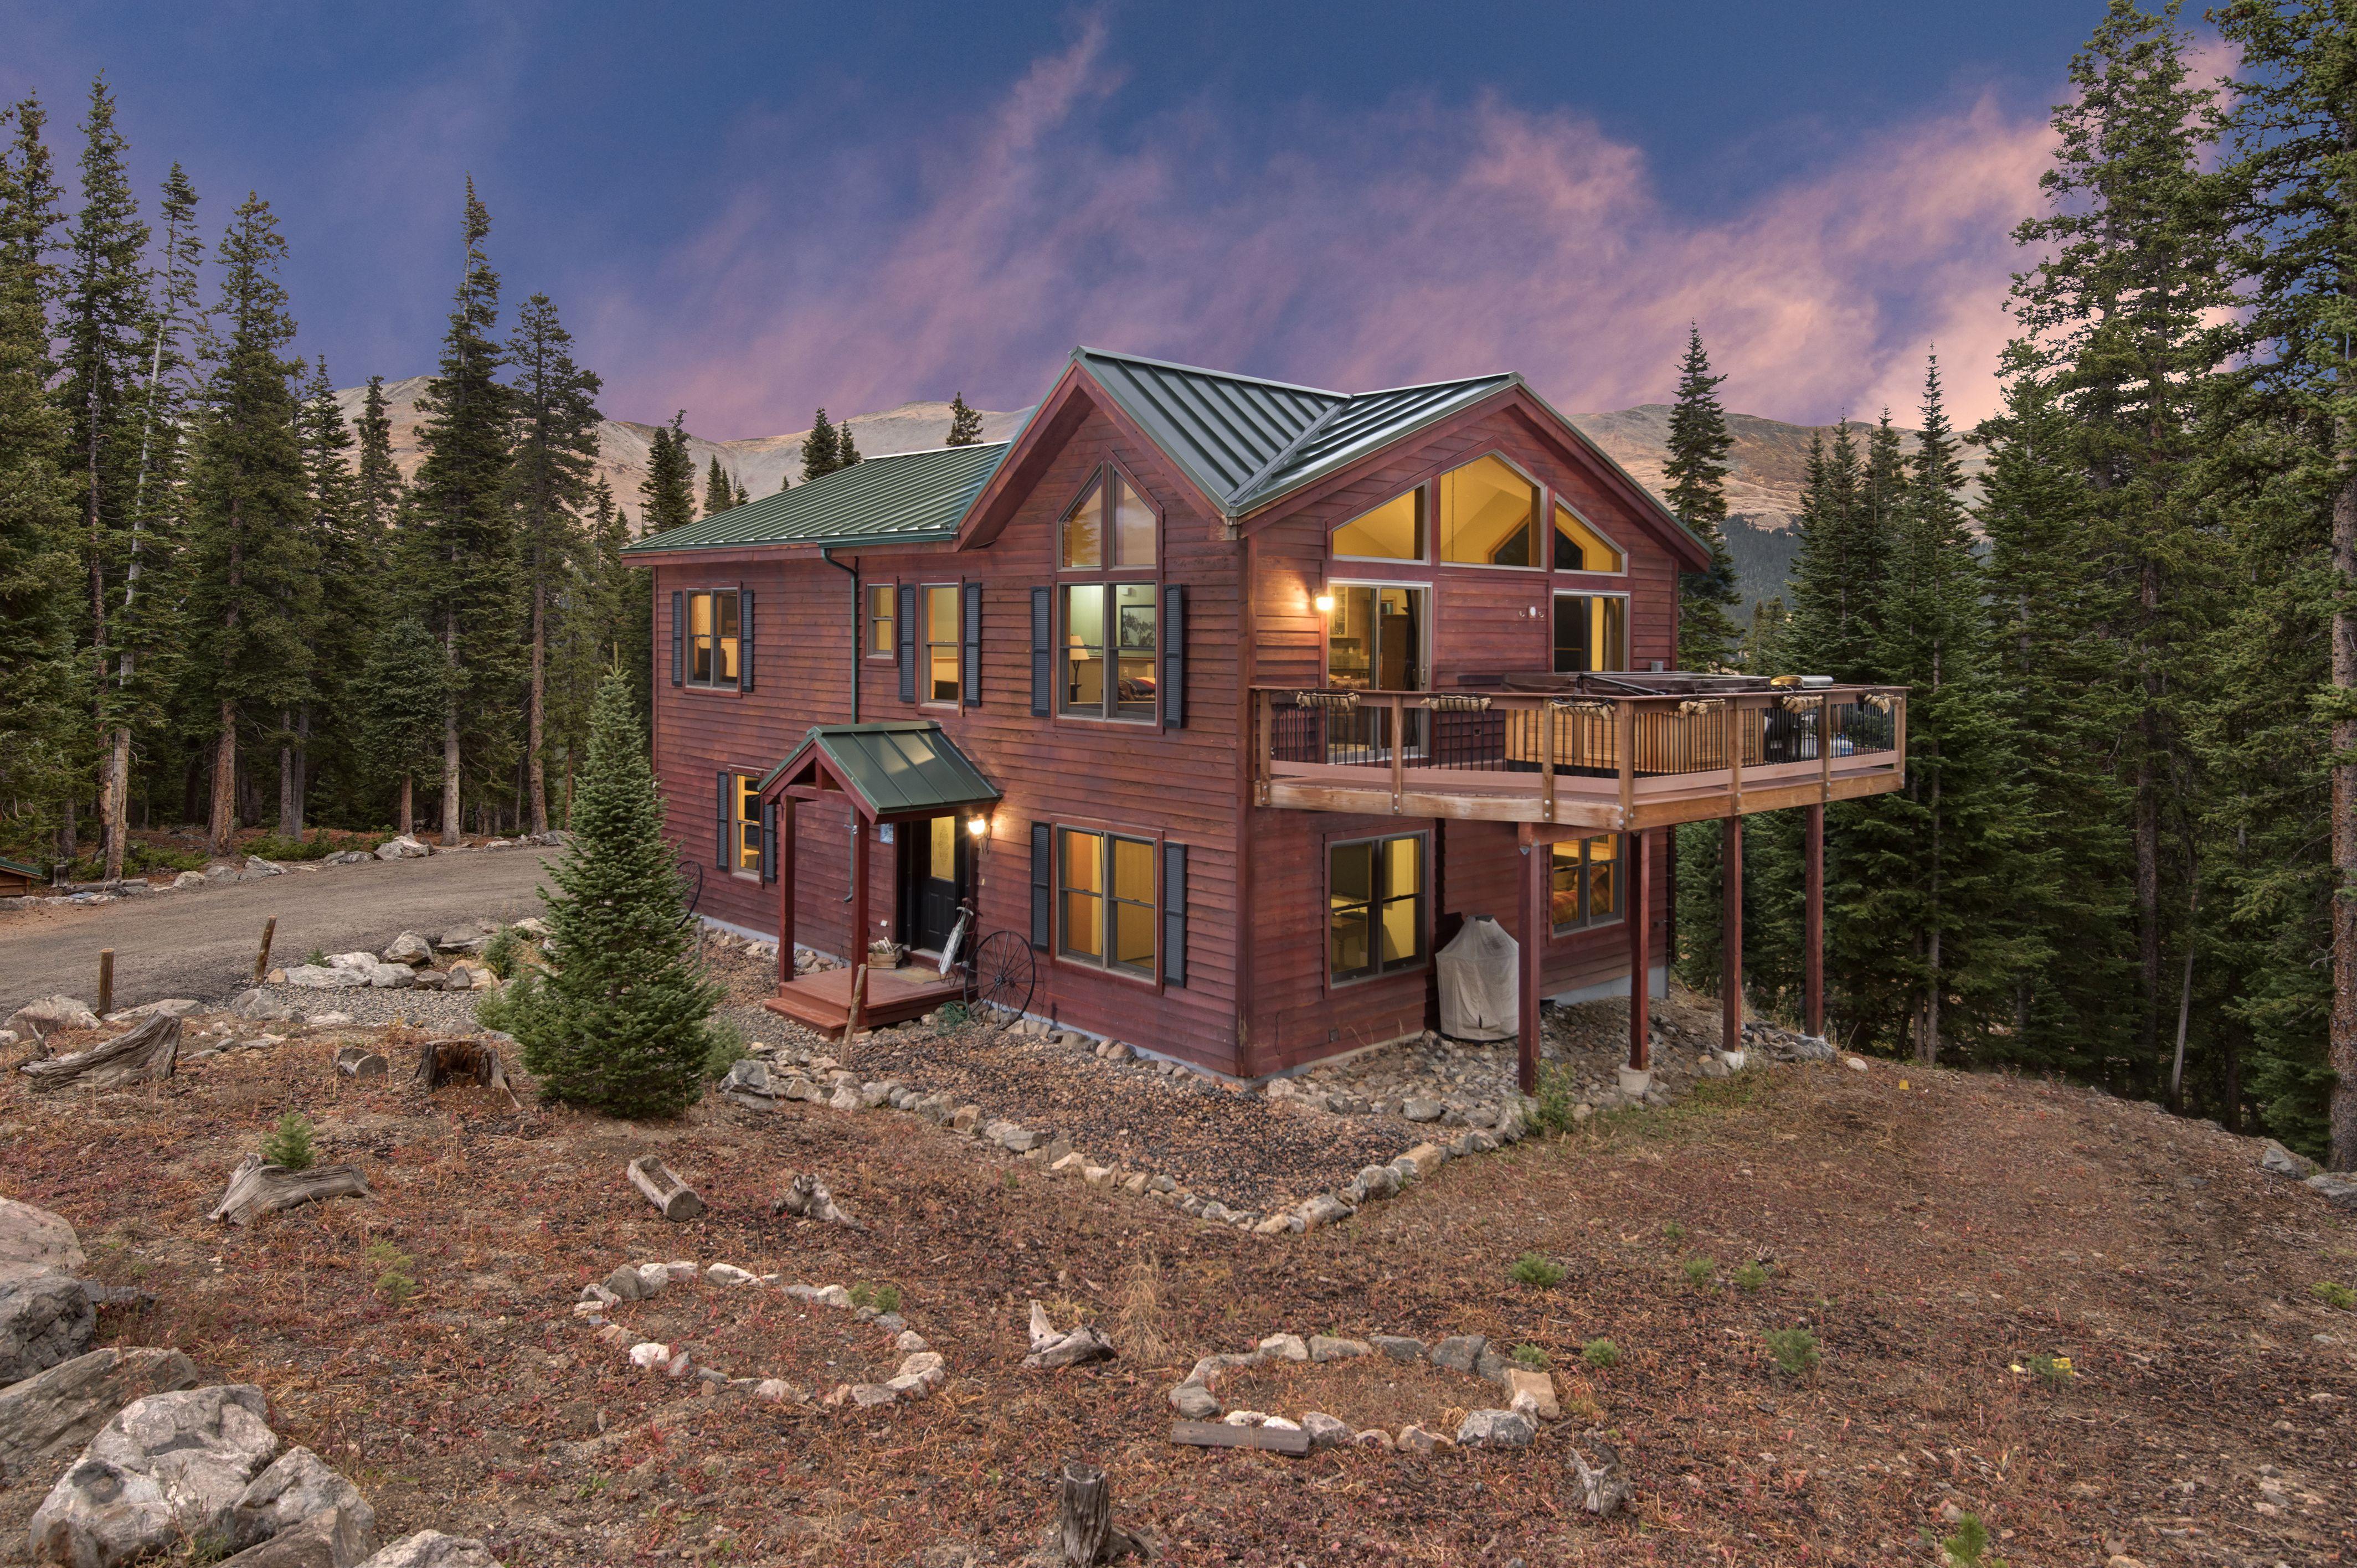 66 HAMILTON LANE BRECKENRIDGE, Colorado 80424